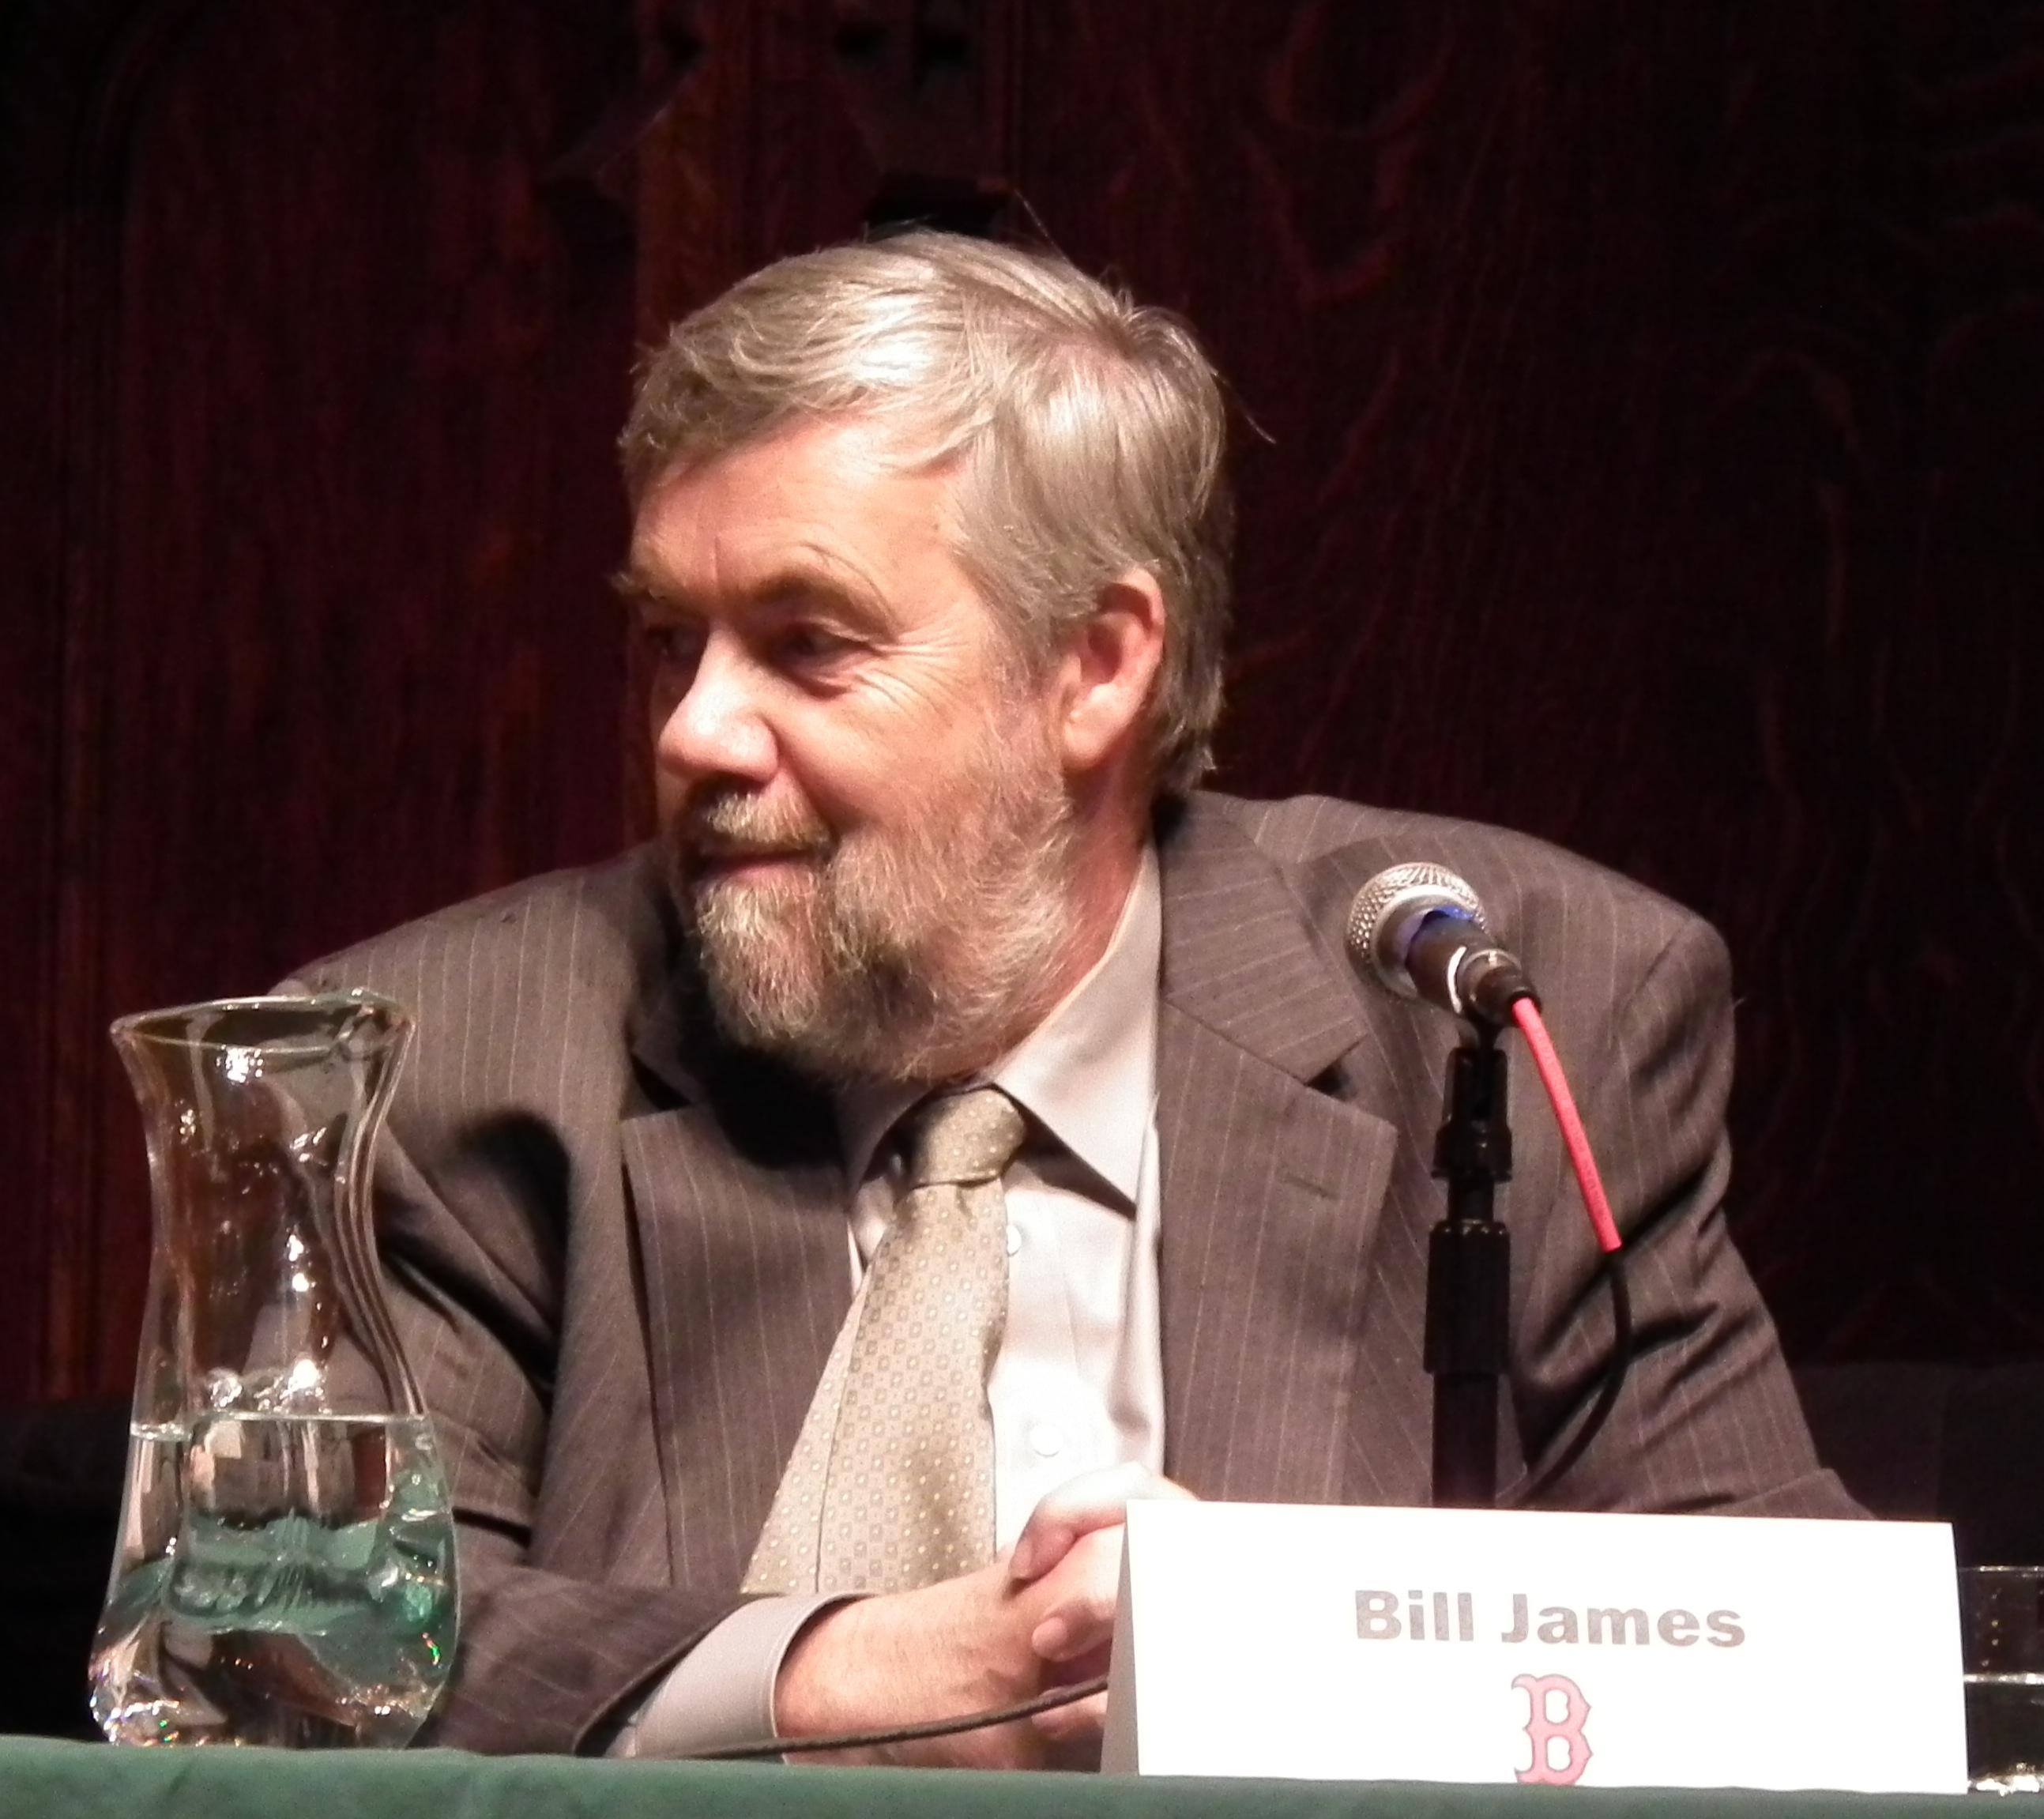 James in 2010